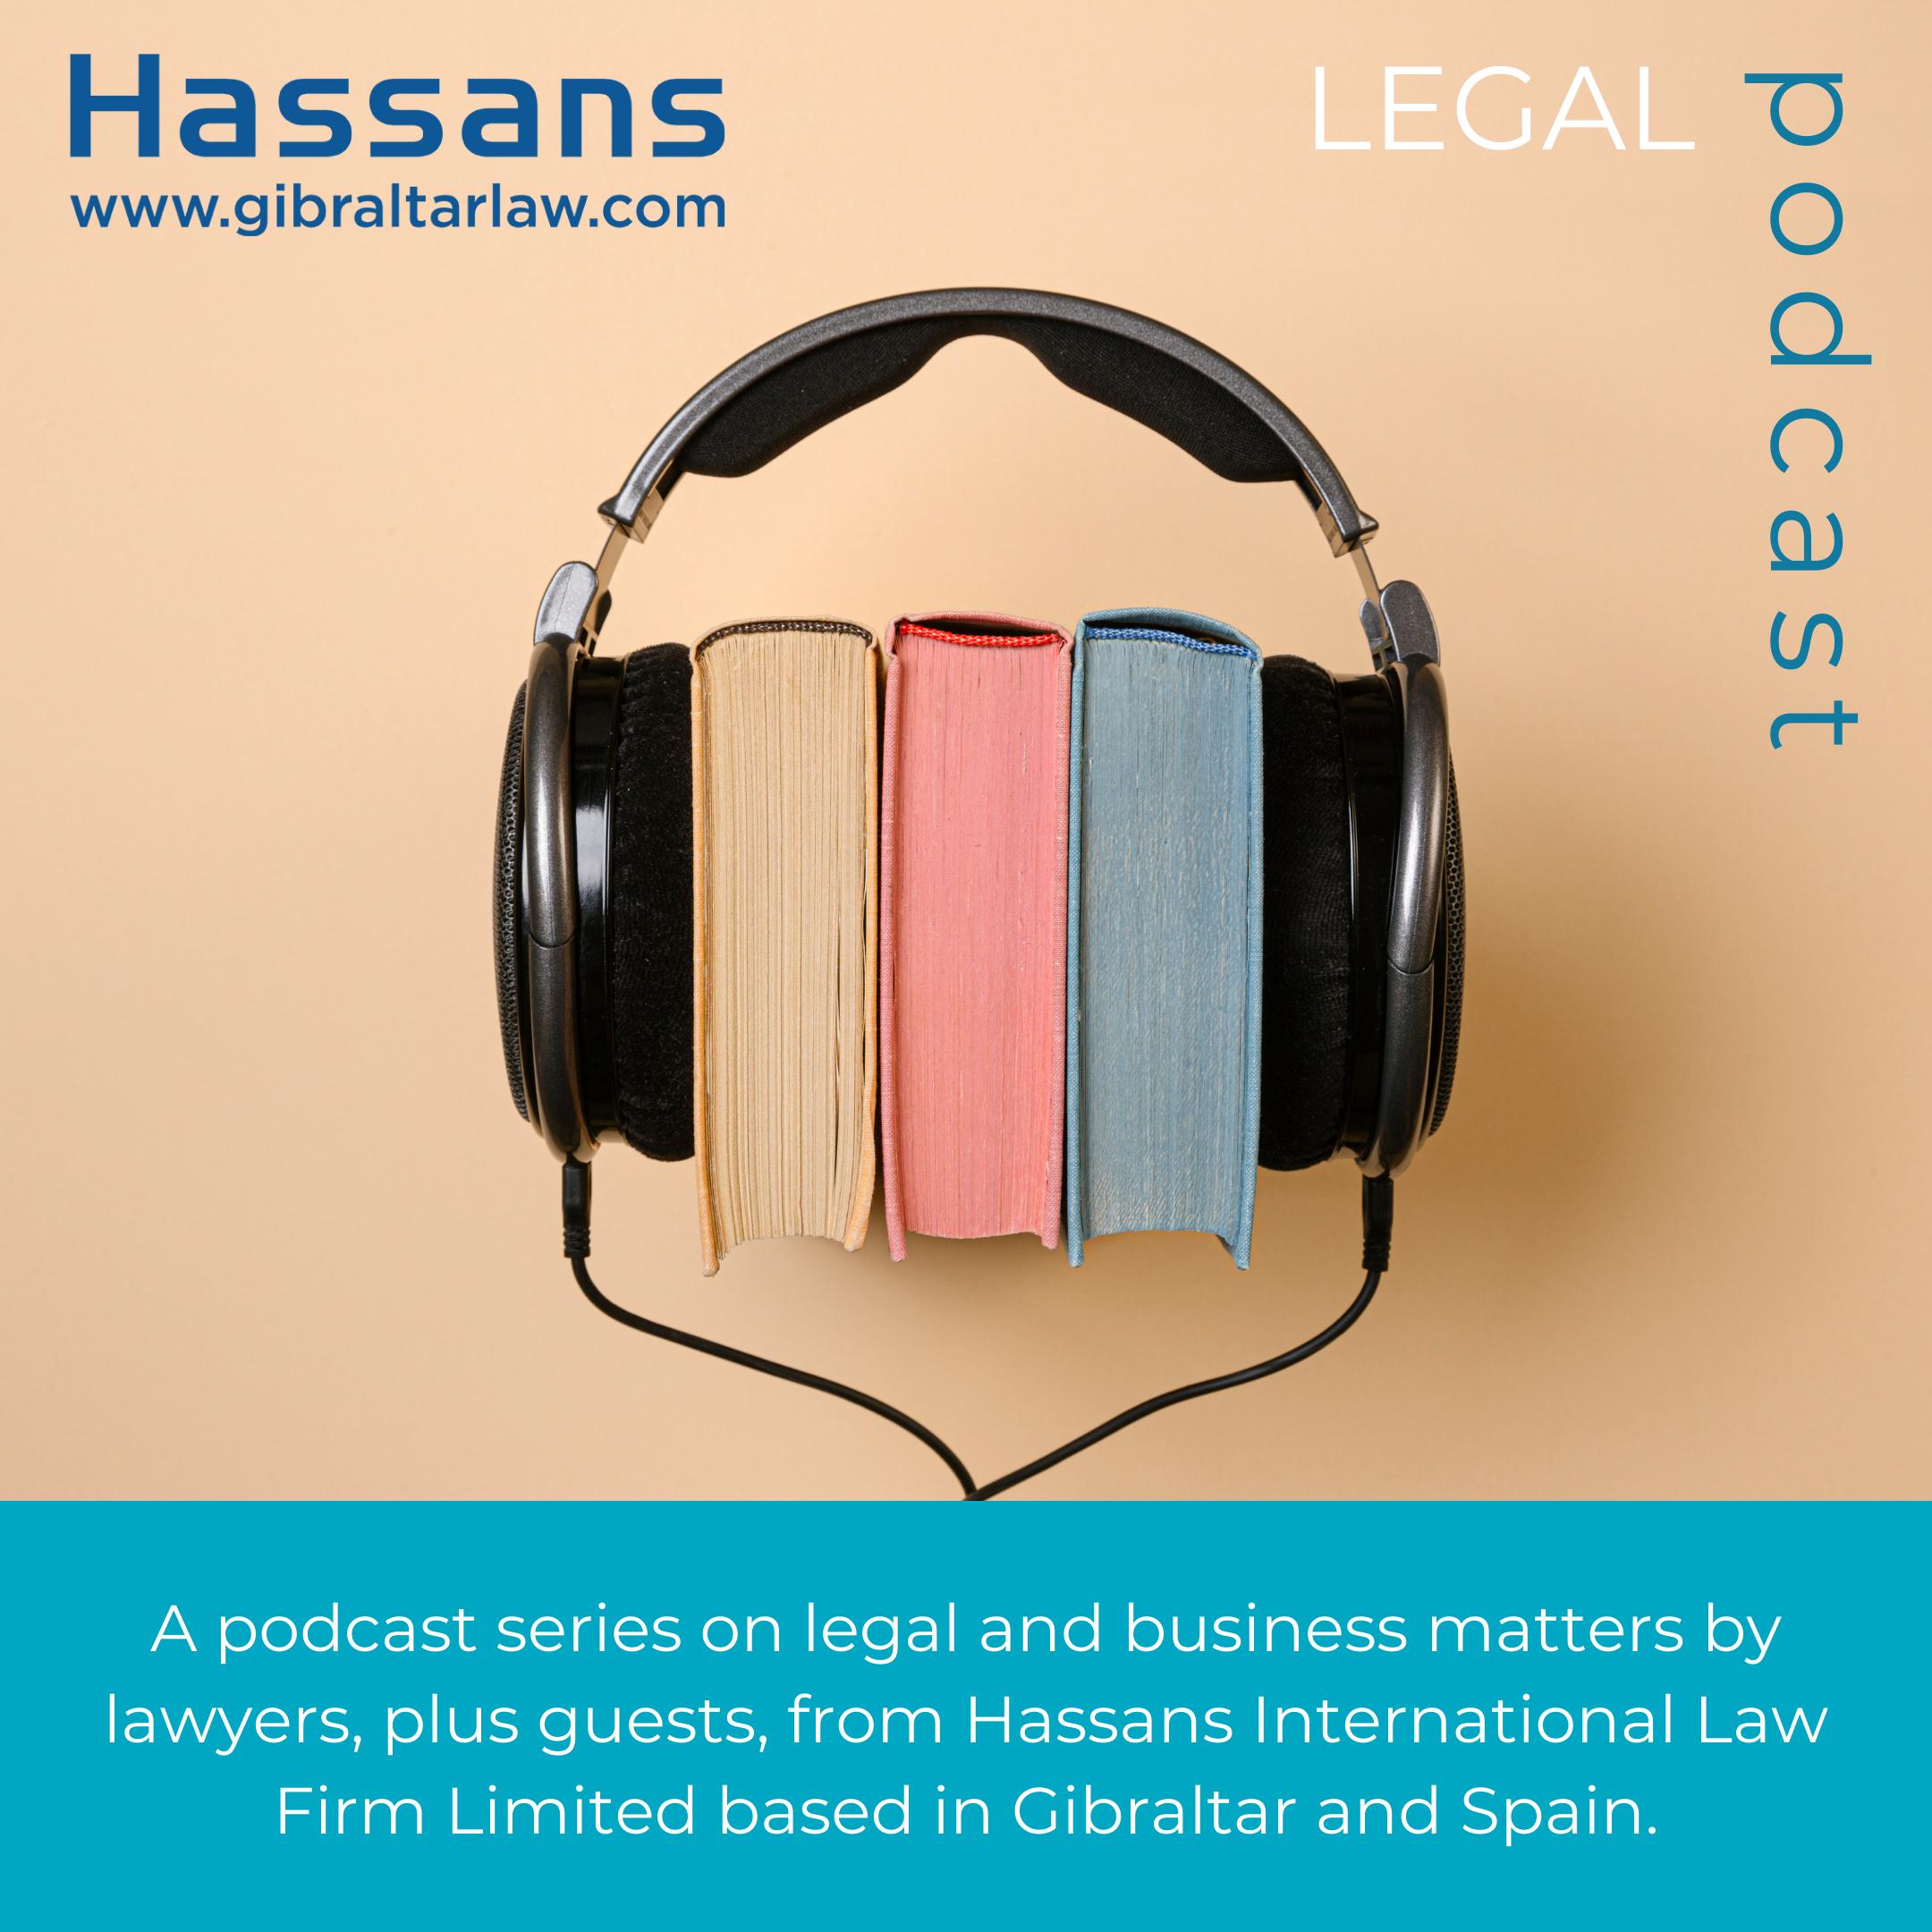 Hassans Podcast